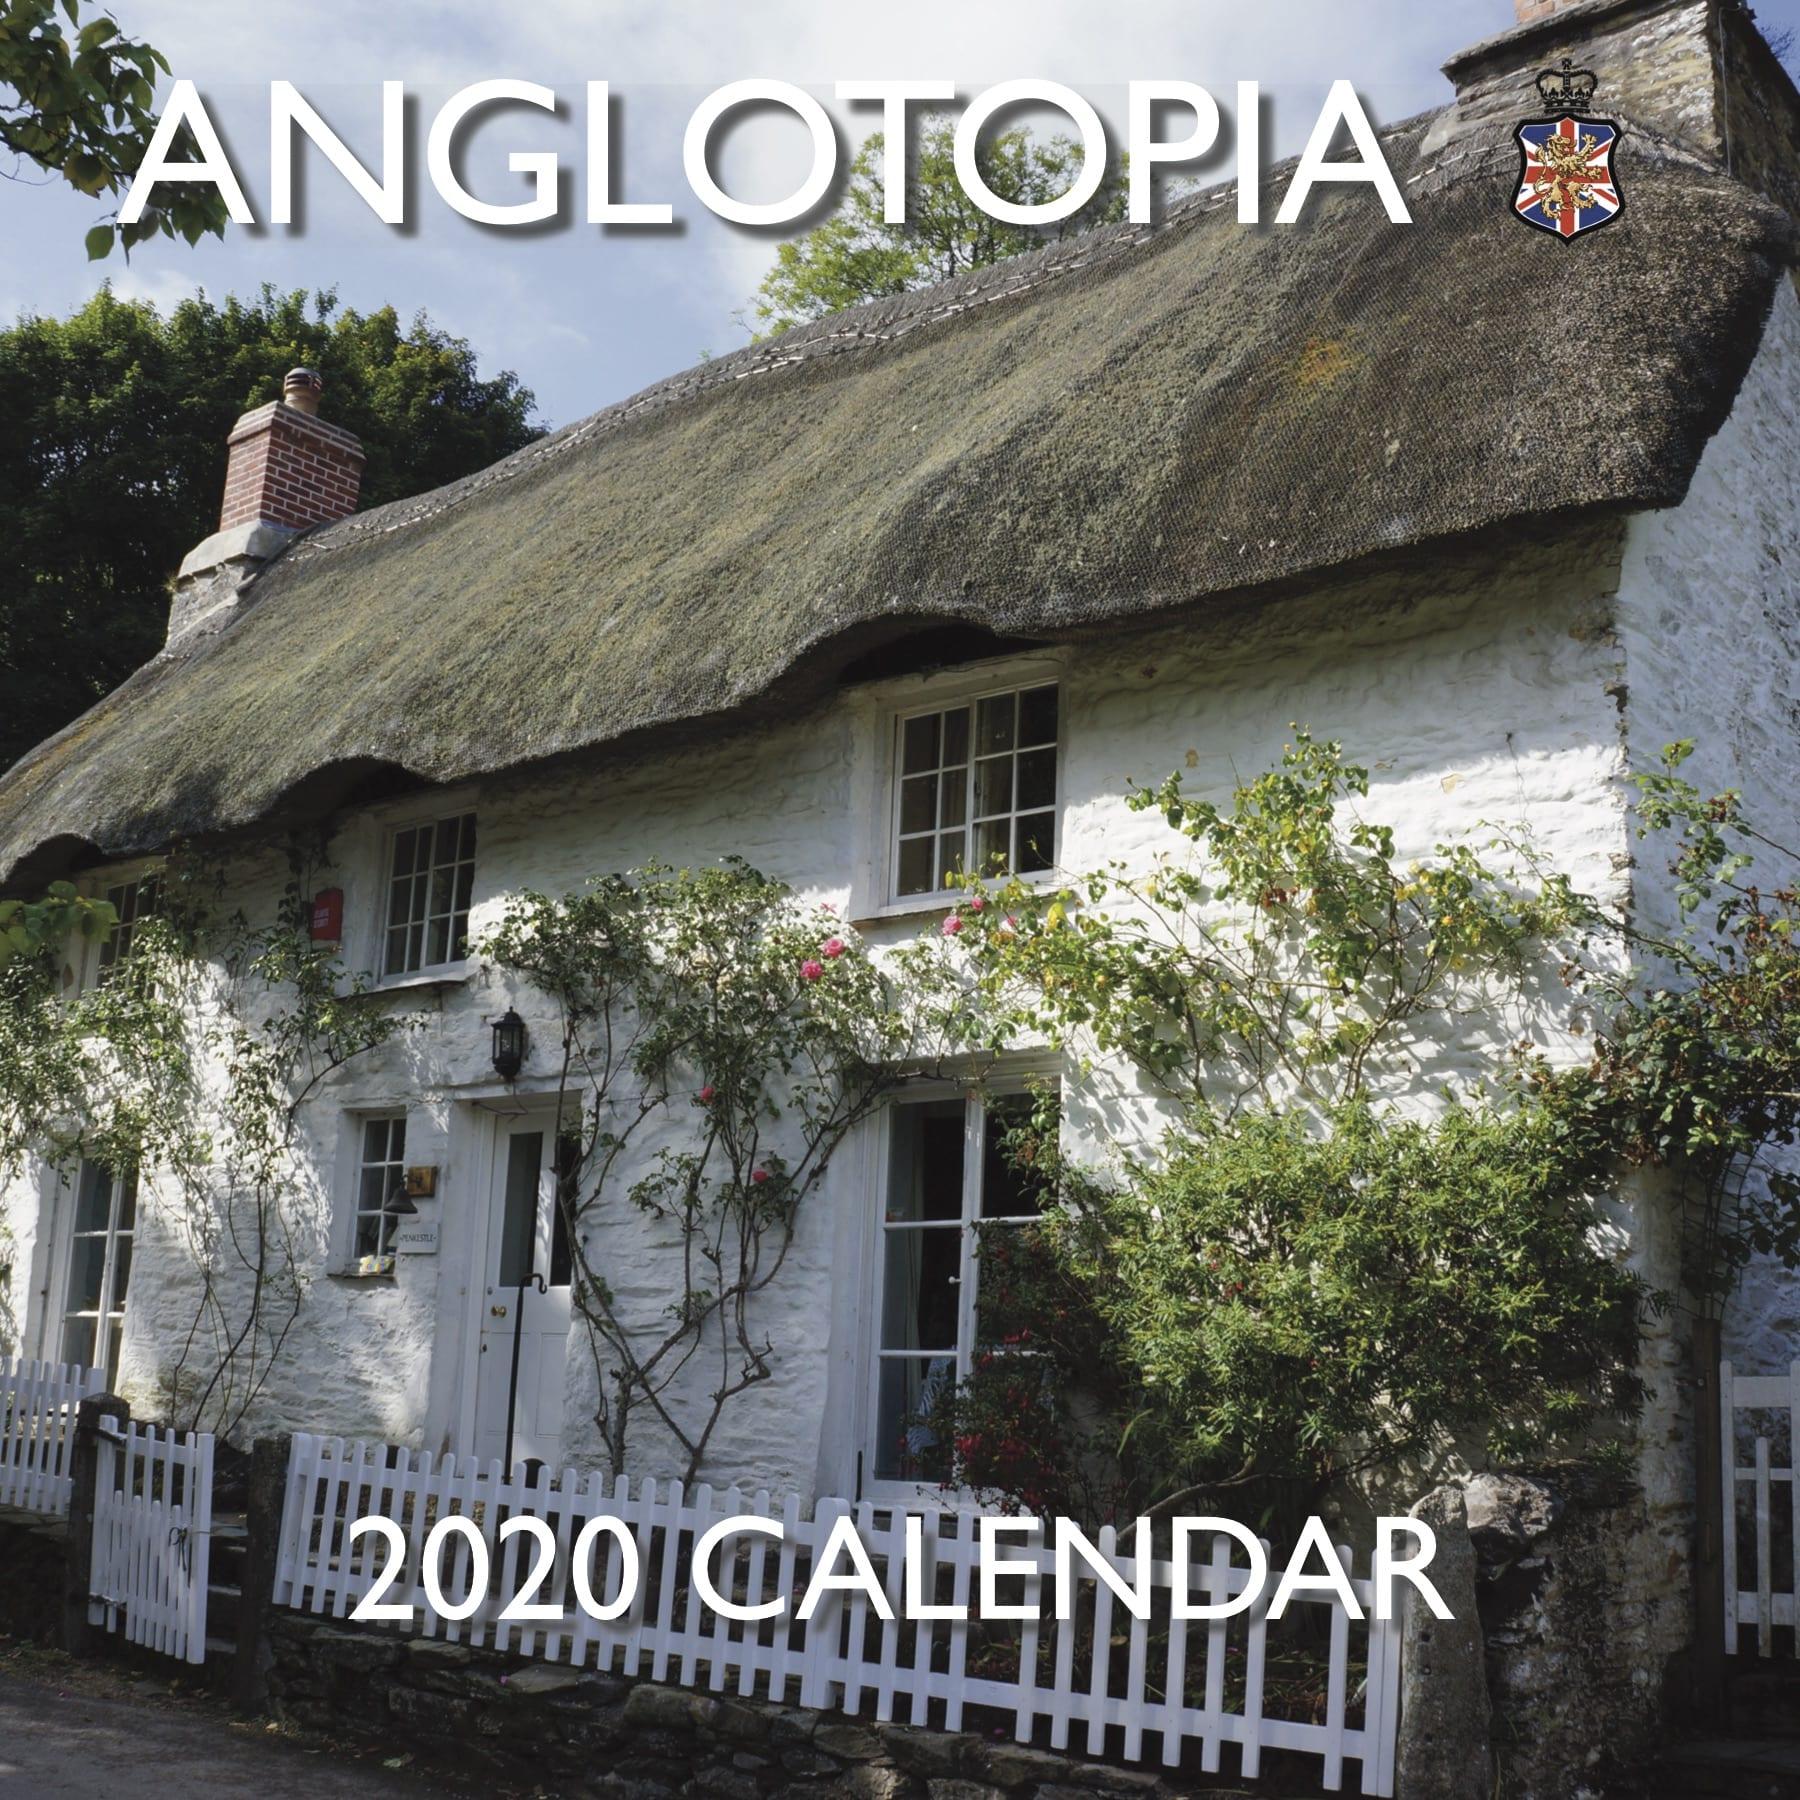 Calendrier Running 2020.Anglotopia 2020 Calendar